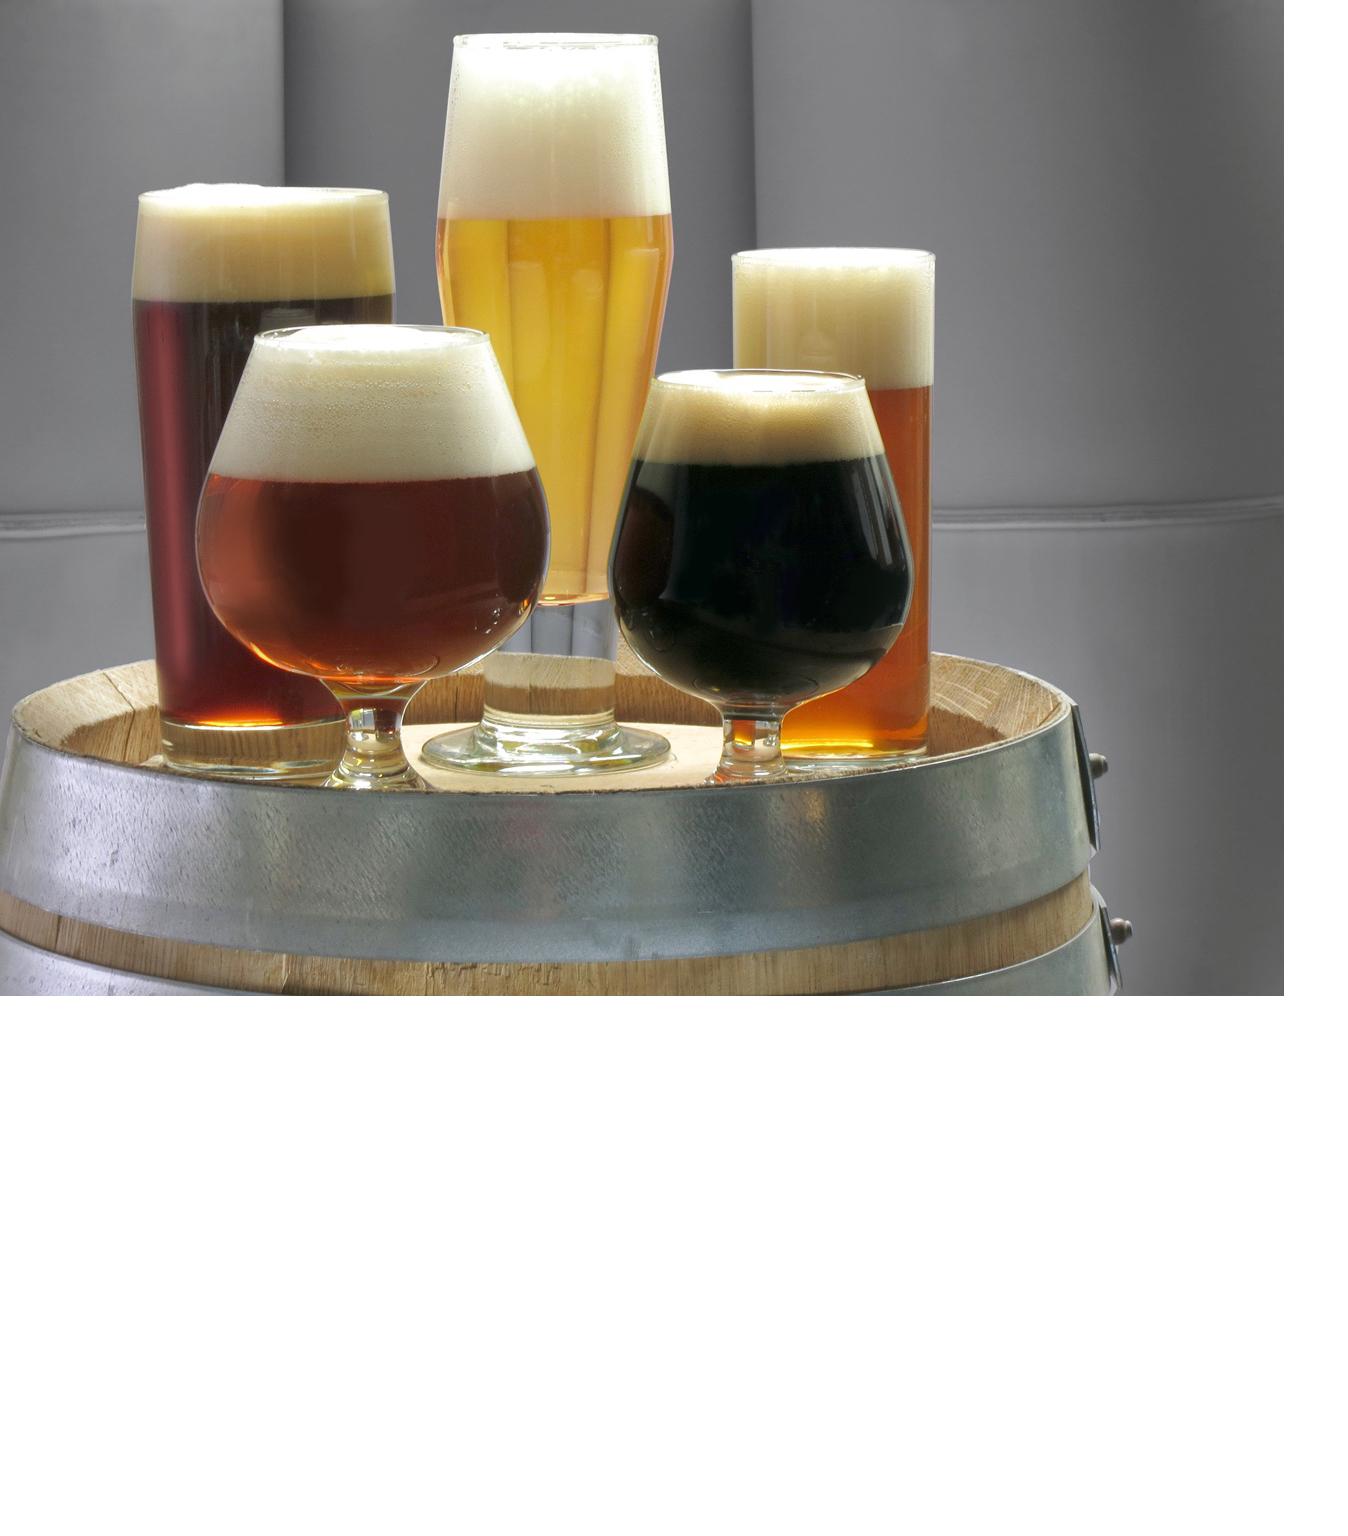 Kinslahger Brewing Company